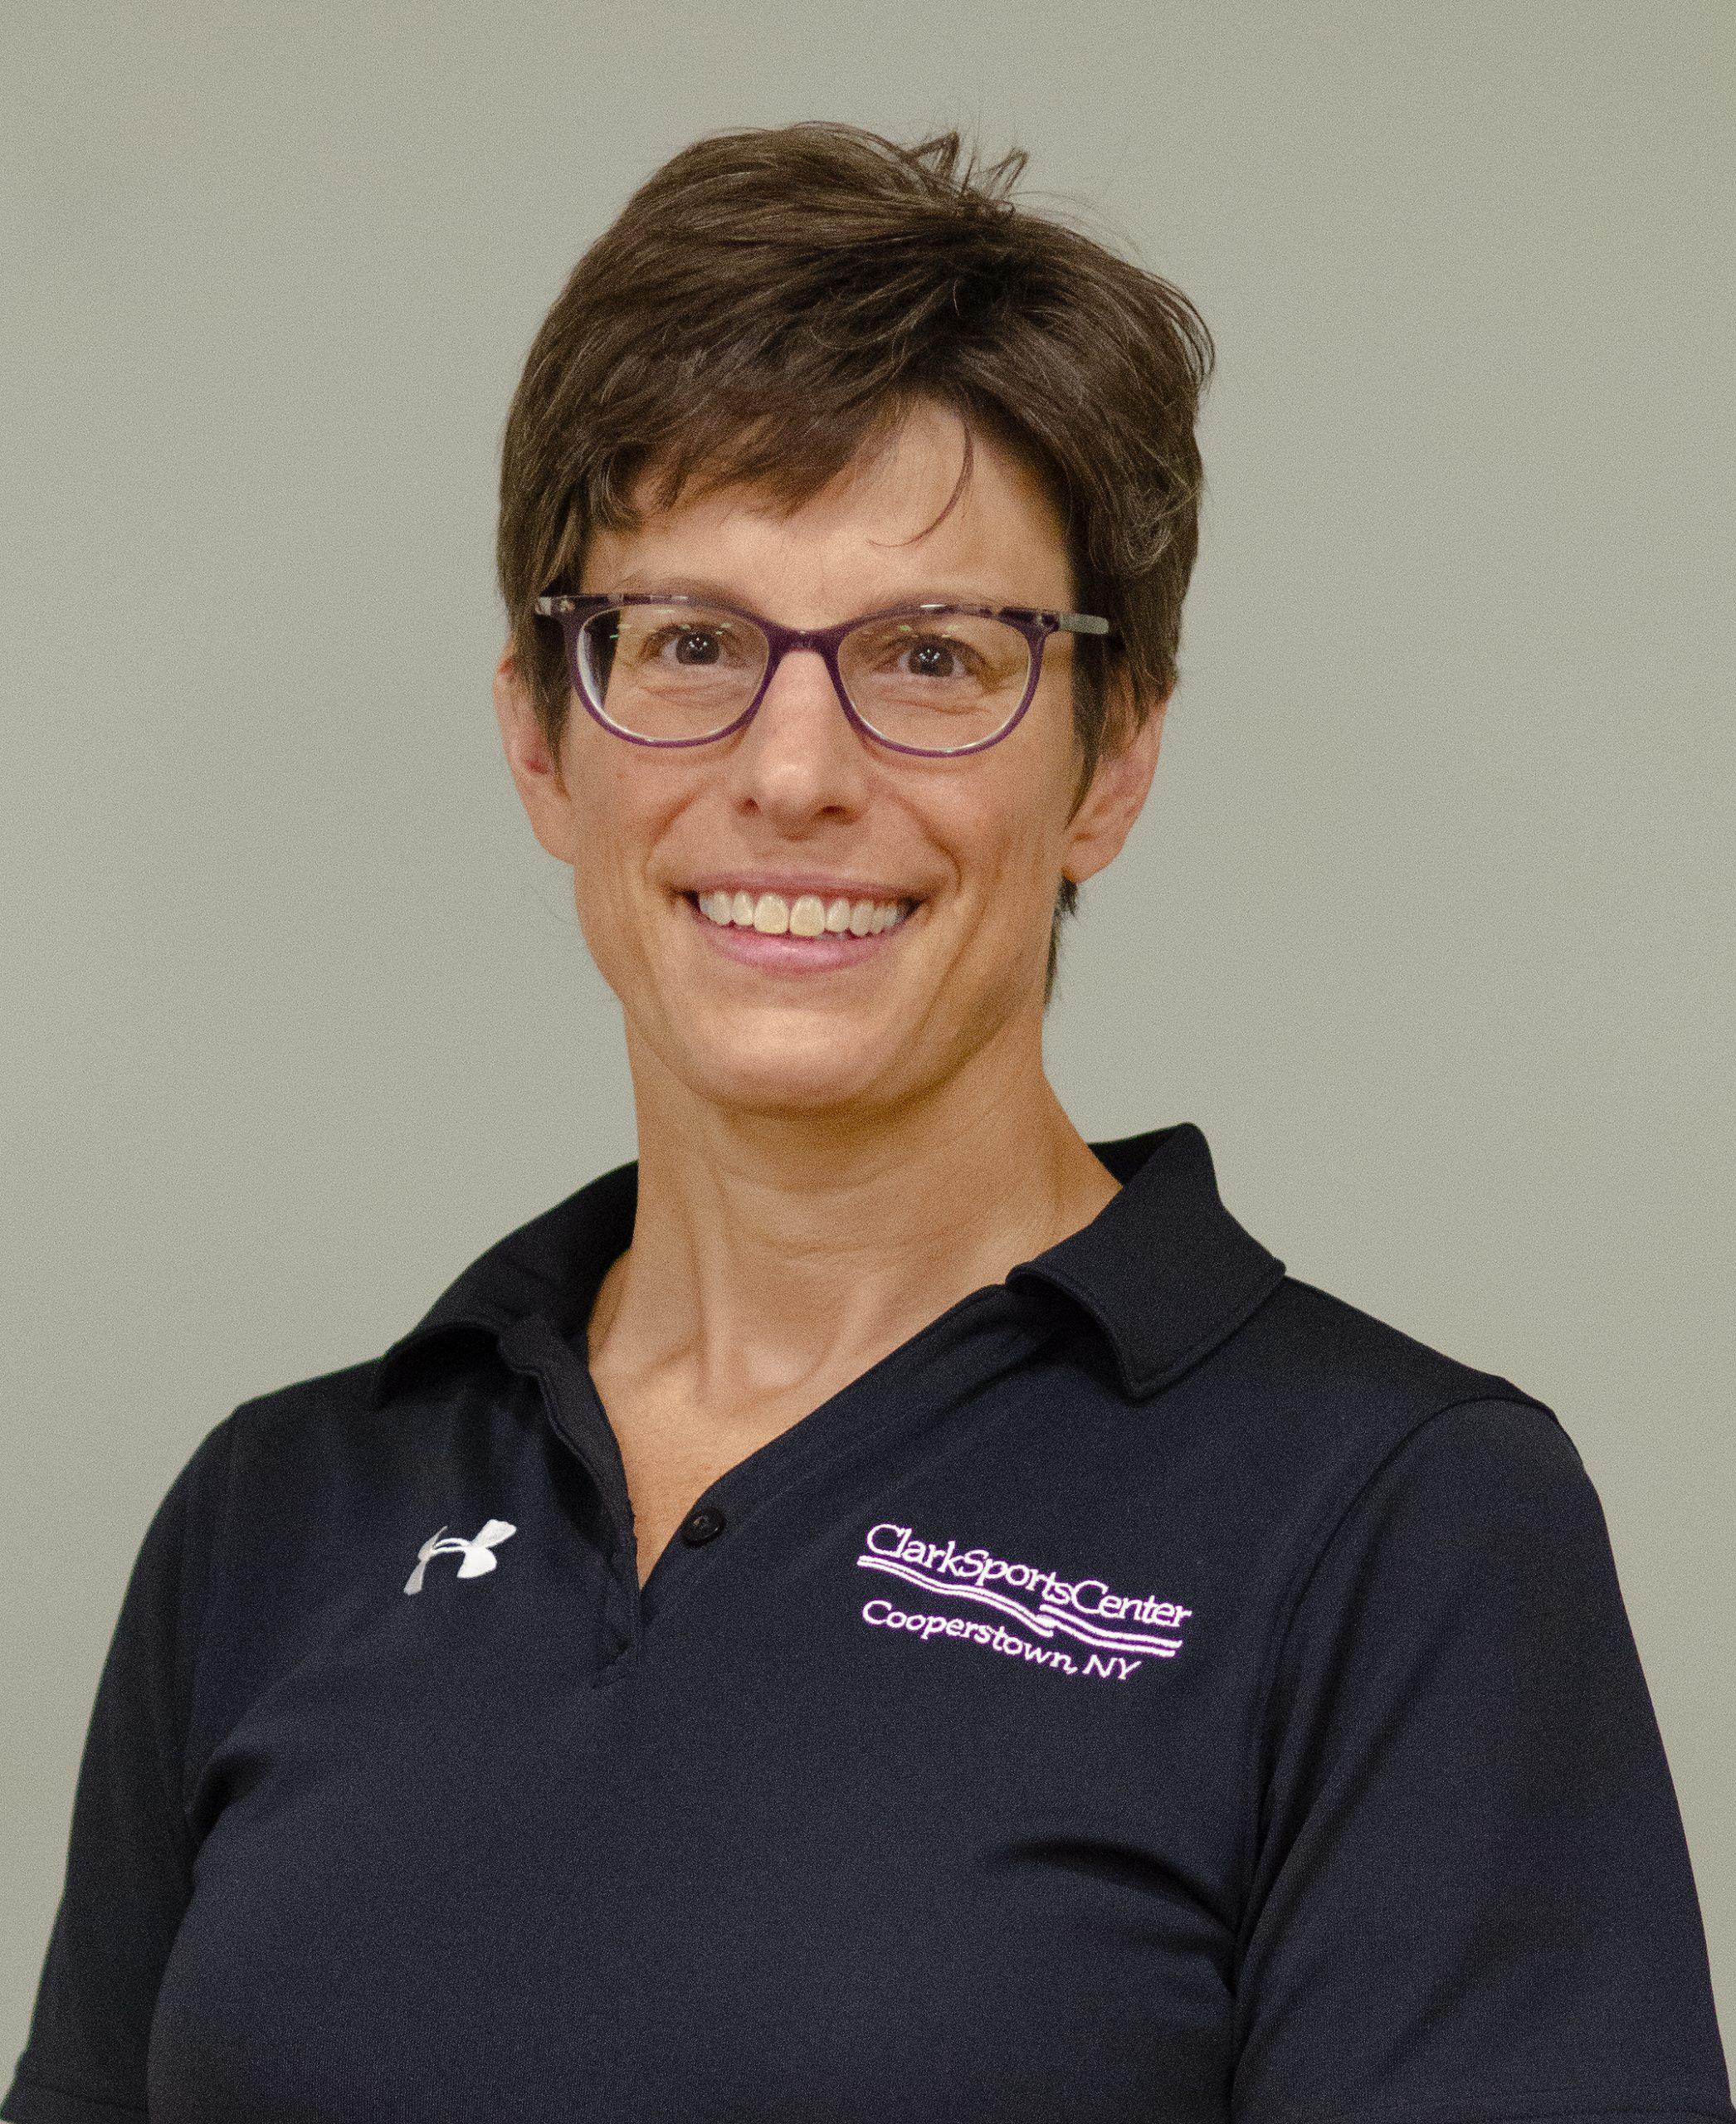 Lara Hurysz (Customer Service)